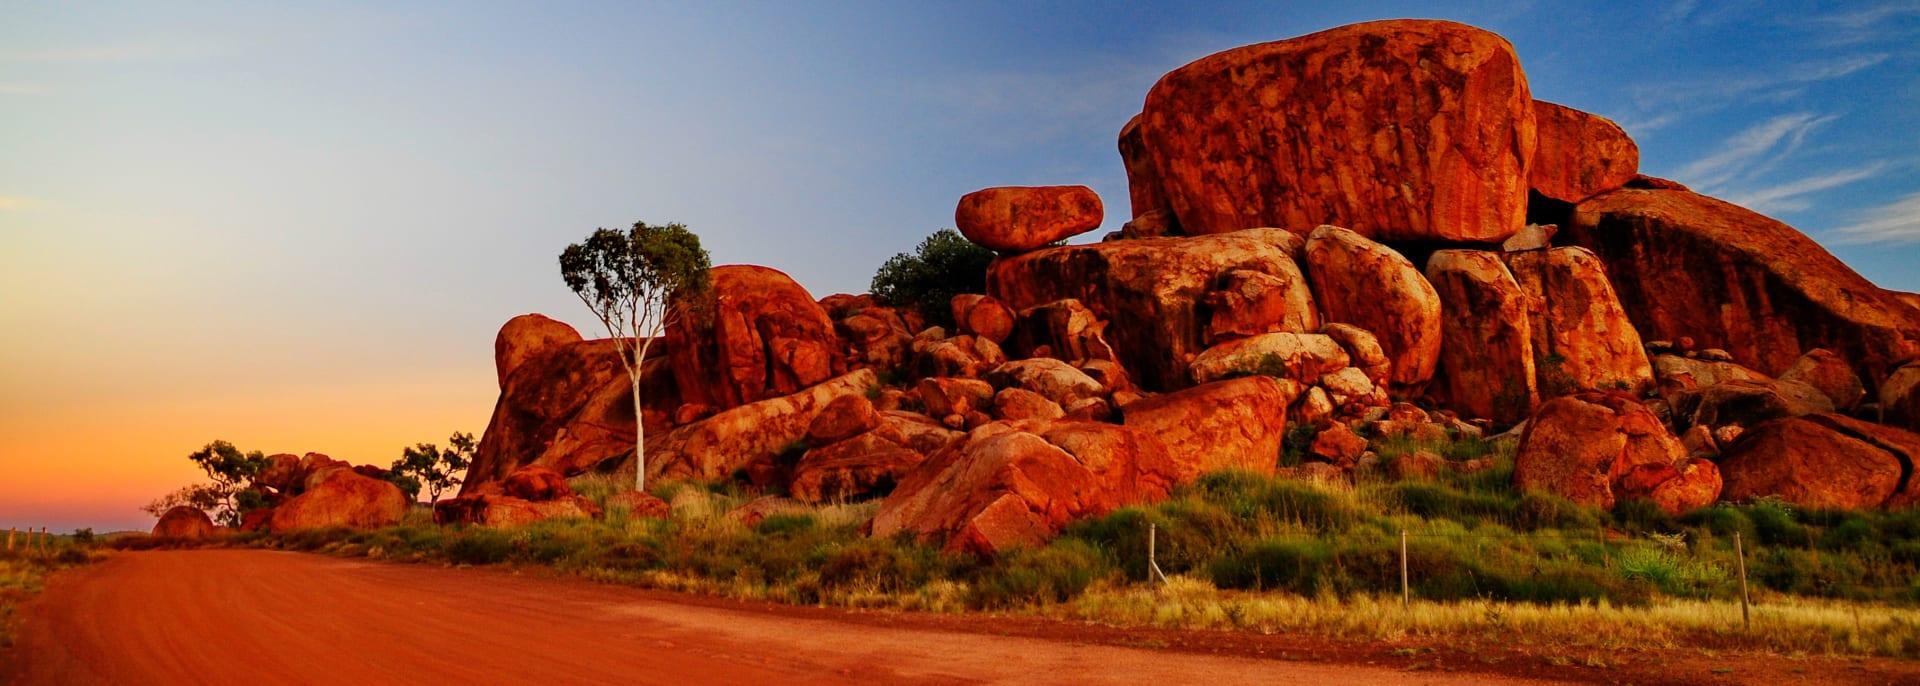 Devil Marmor, Northern Territory, Australia